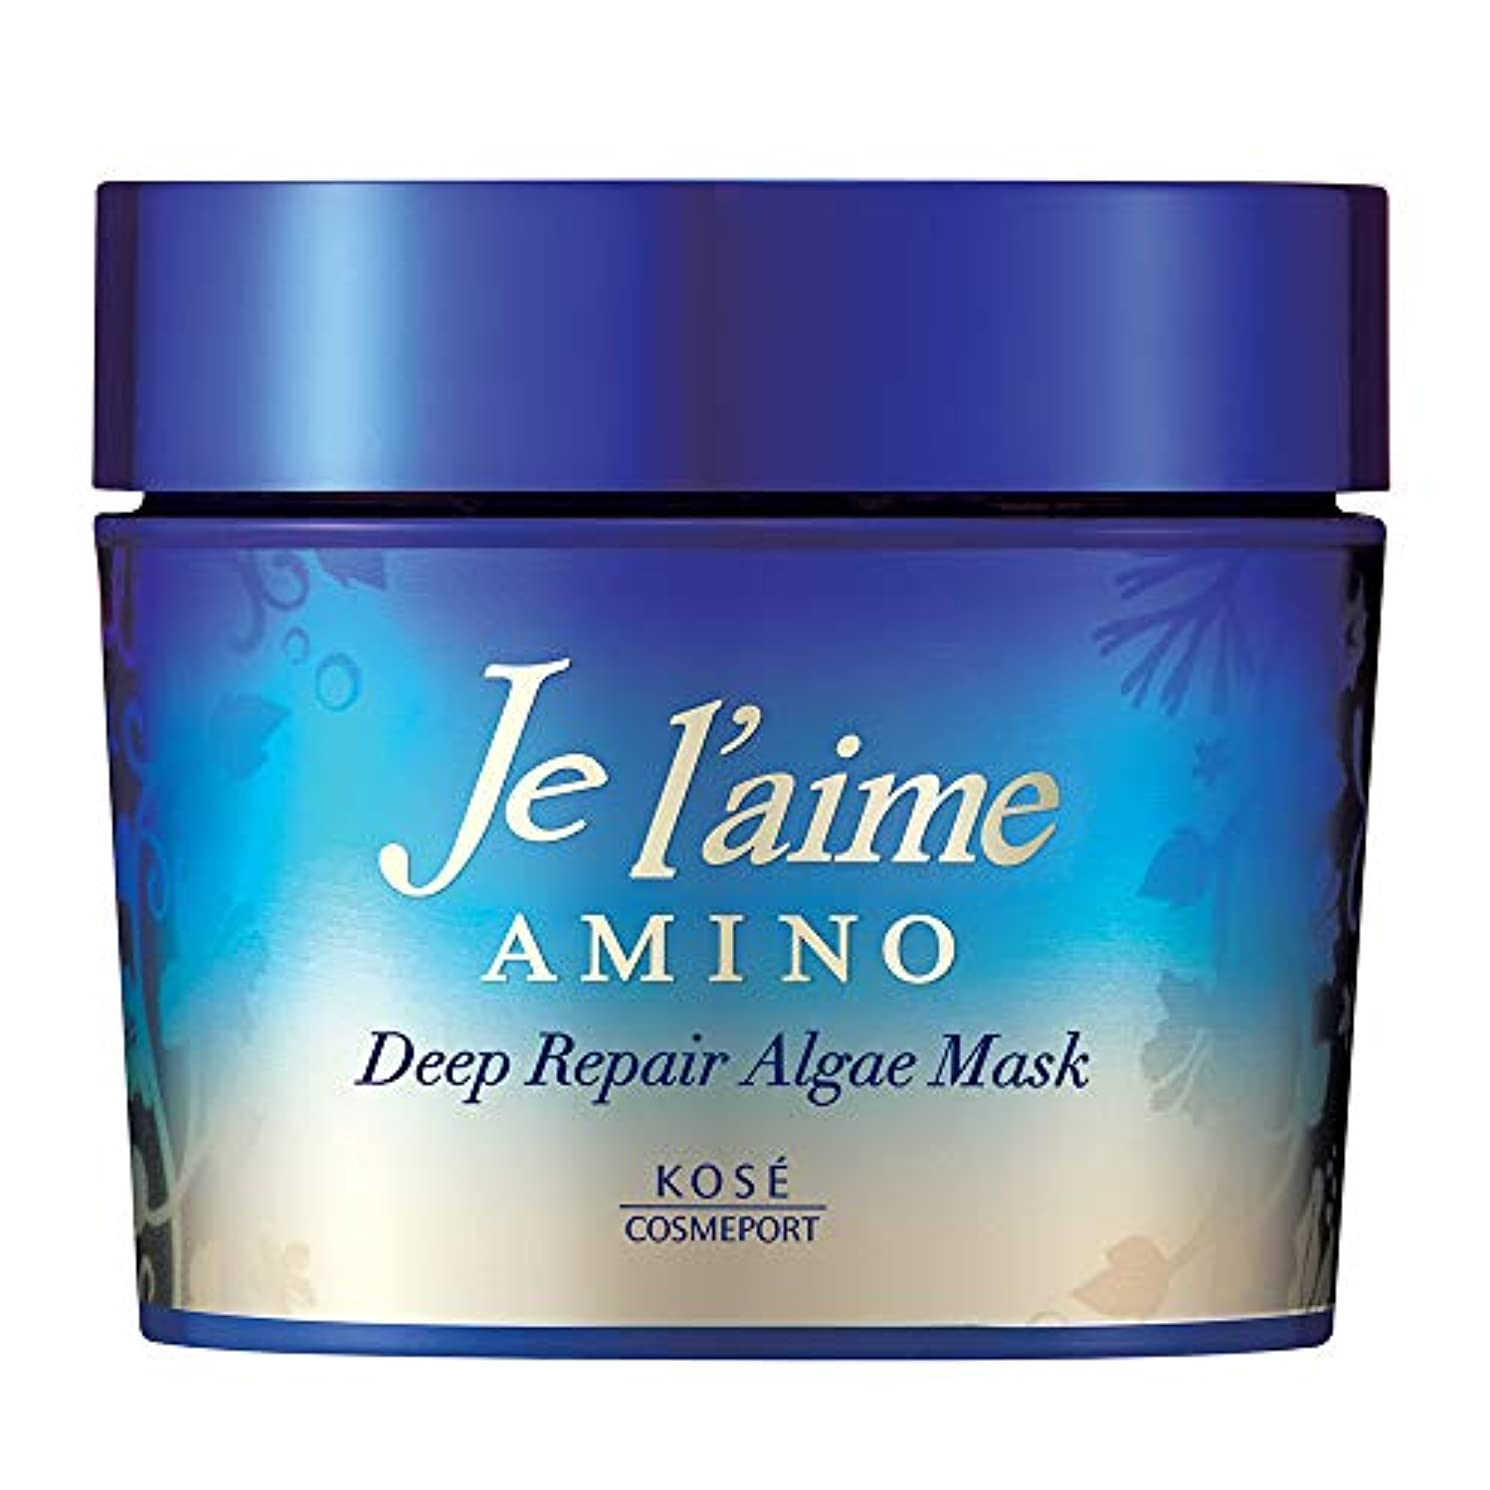 KOSE コーセー ジュレーム アミノ ディープ リペア アルゲ ヘアマスク トリートメント アミノ酸 配合 200g